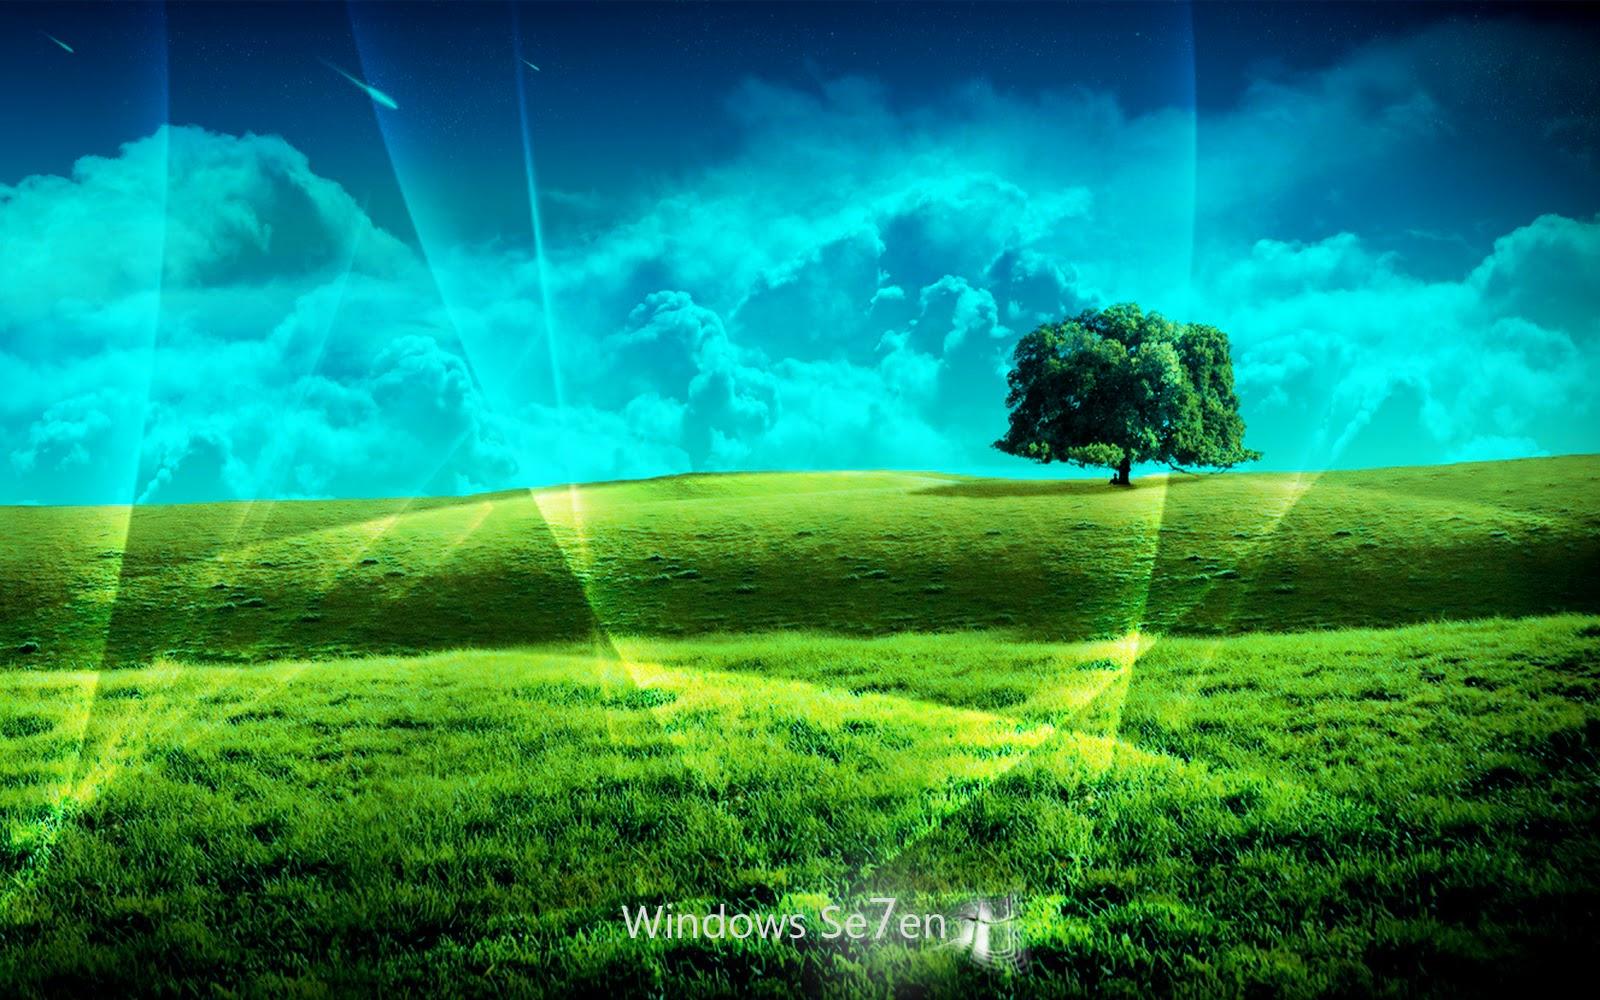 gratis videoredigeringsprogram windows 7